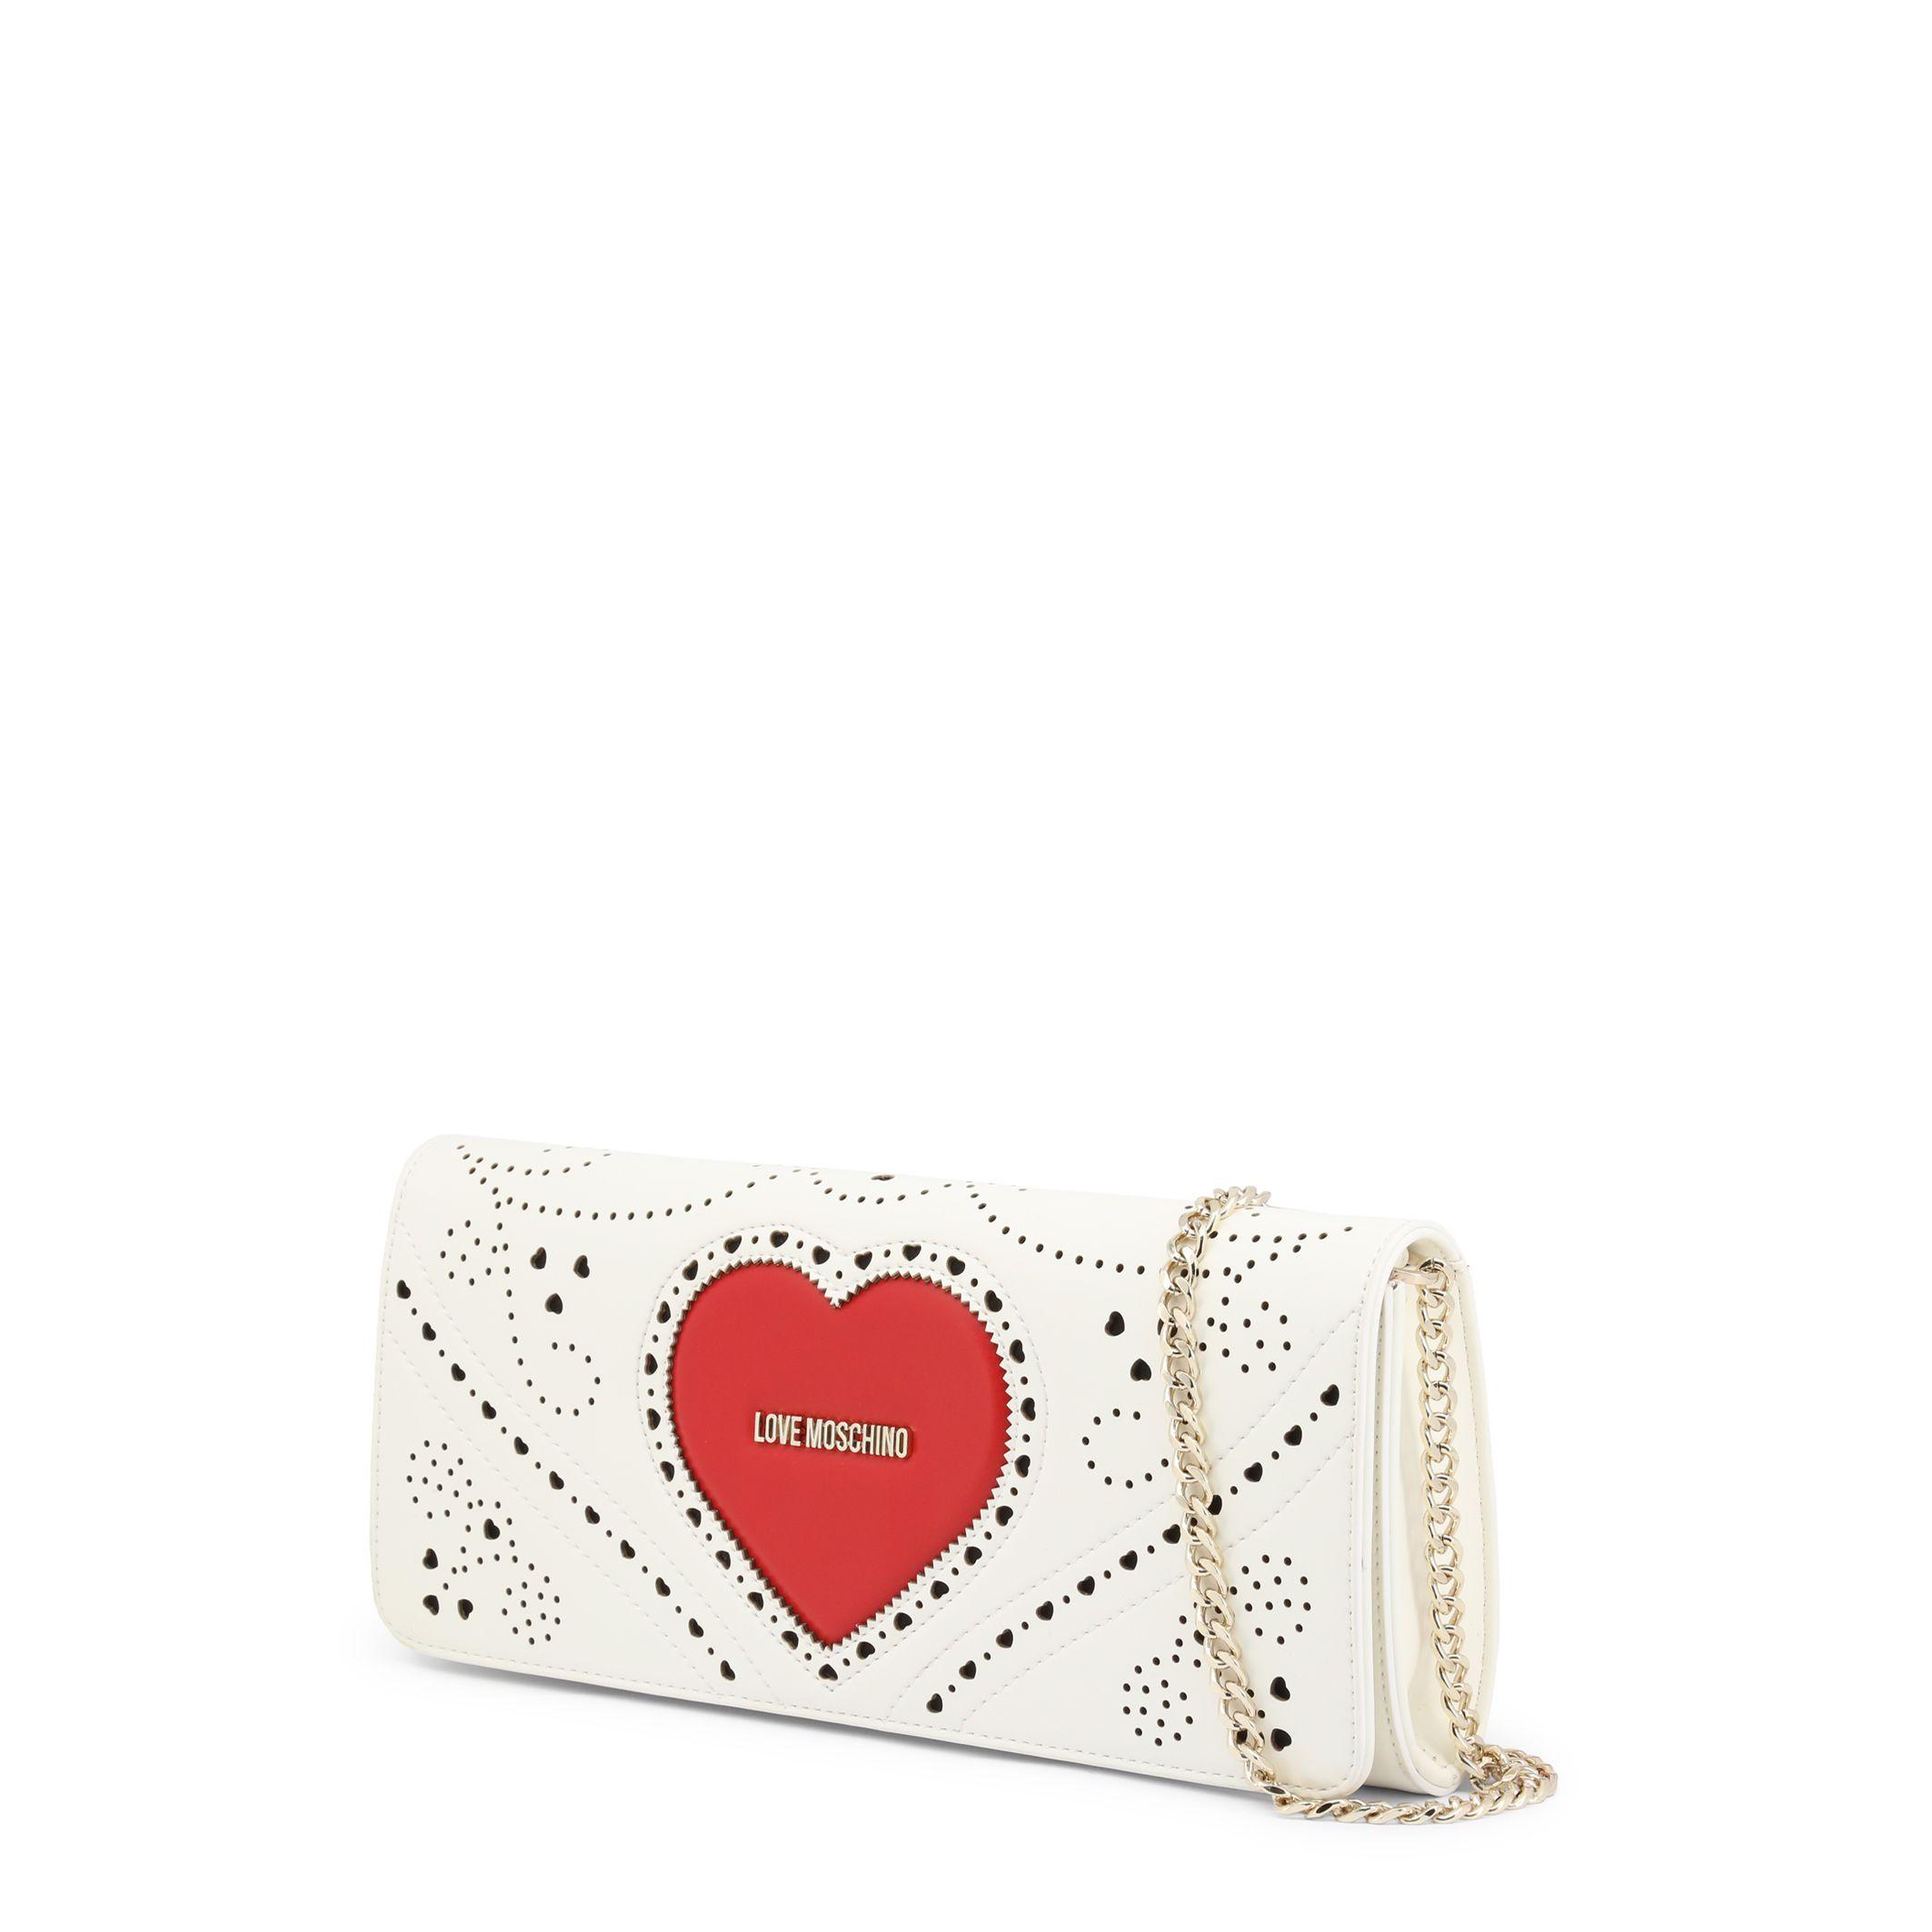 Love Moschino - JC4220PP0AKC   You Fashion Outlet